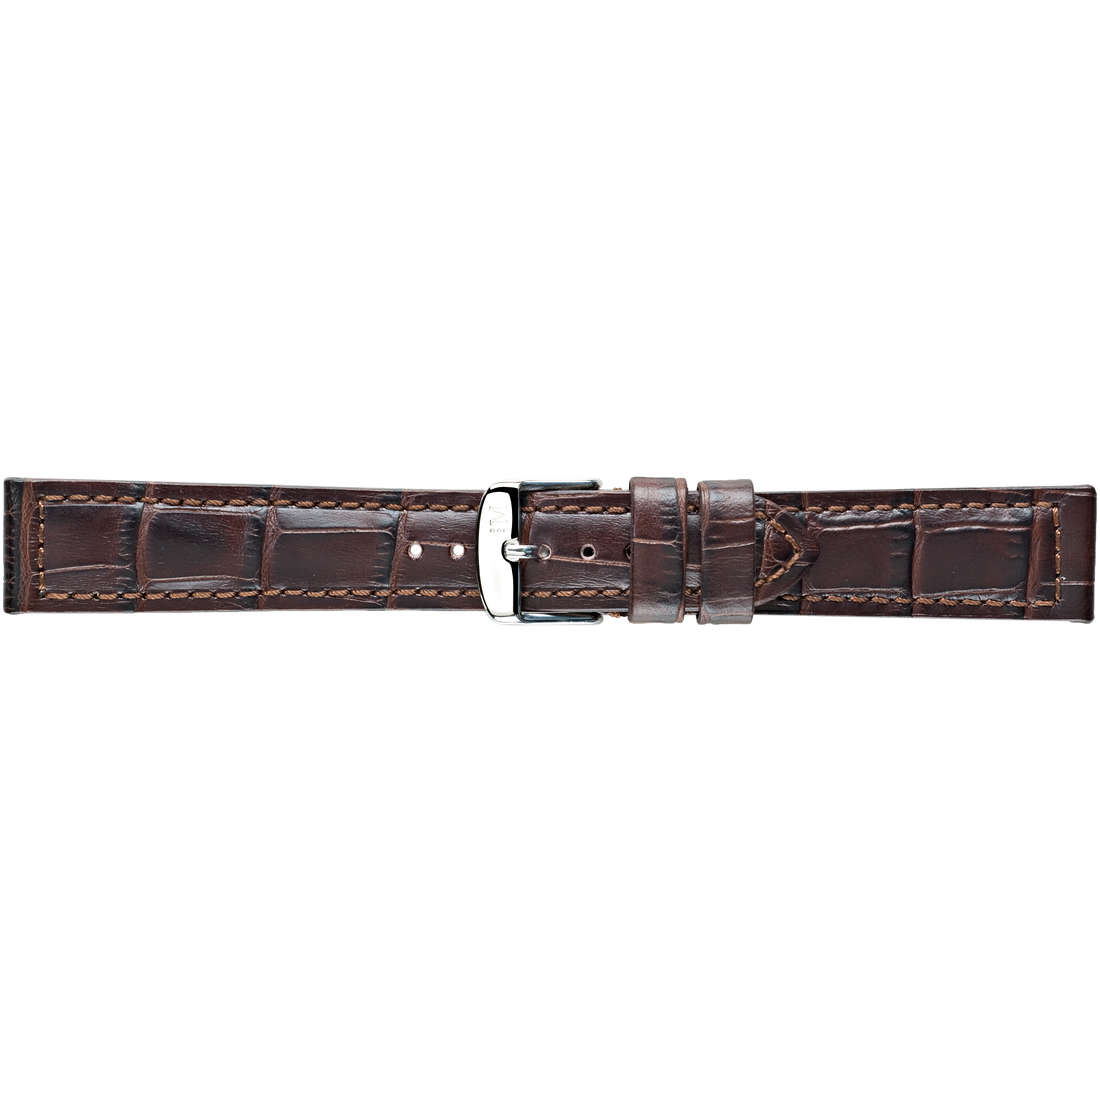 watch watch bands watch straps man Morellato Manufatti A01U2226480032CR22